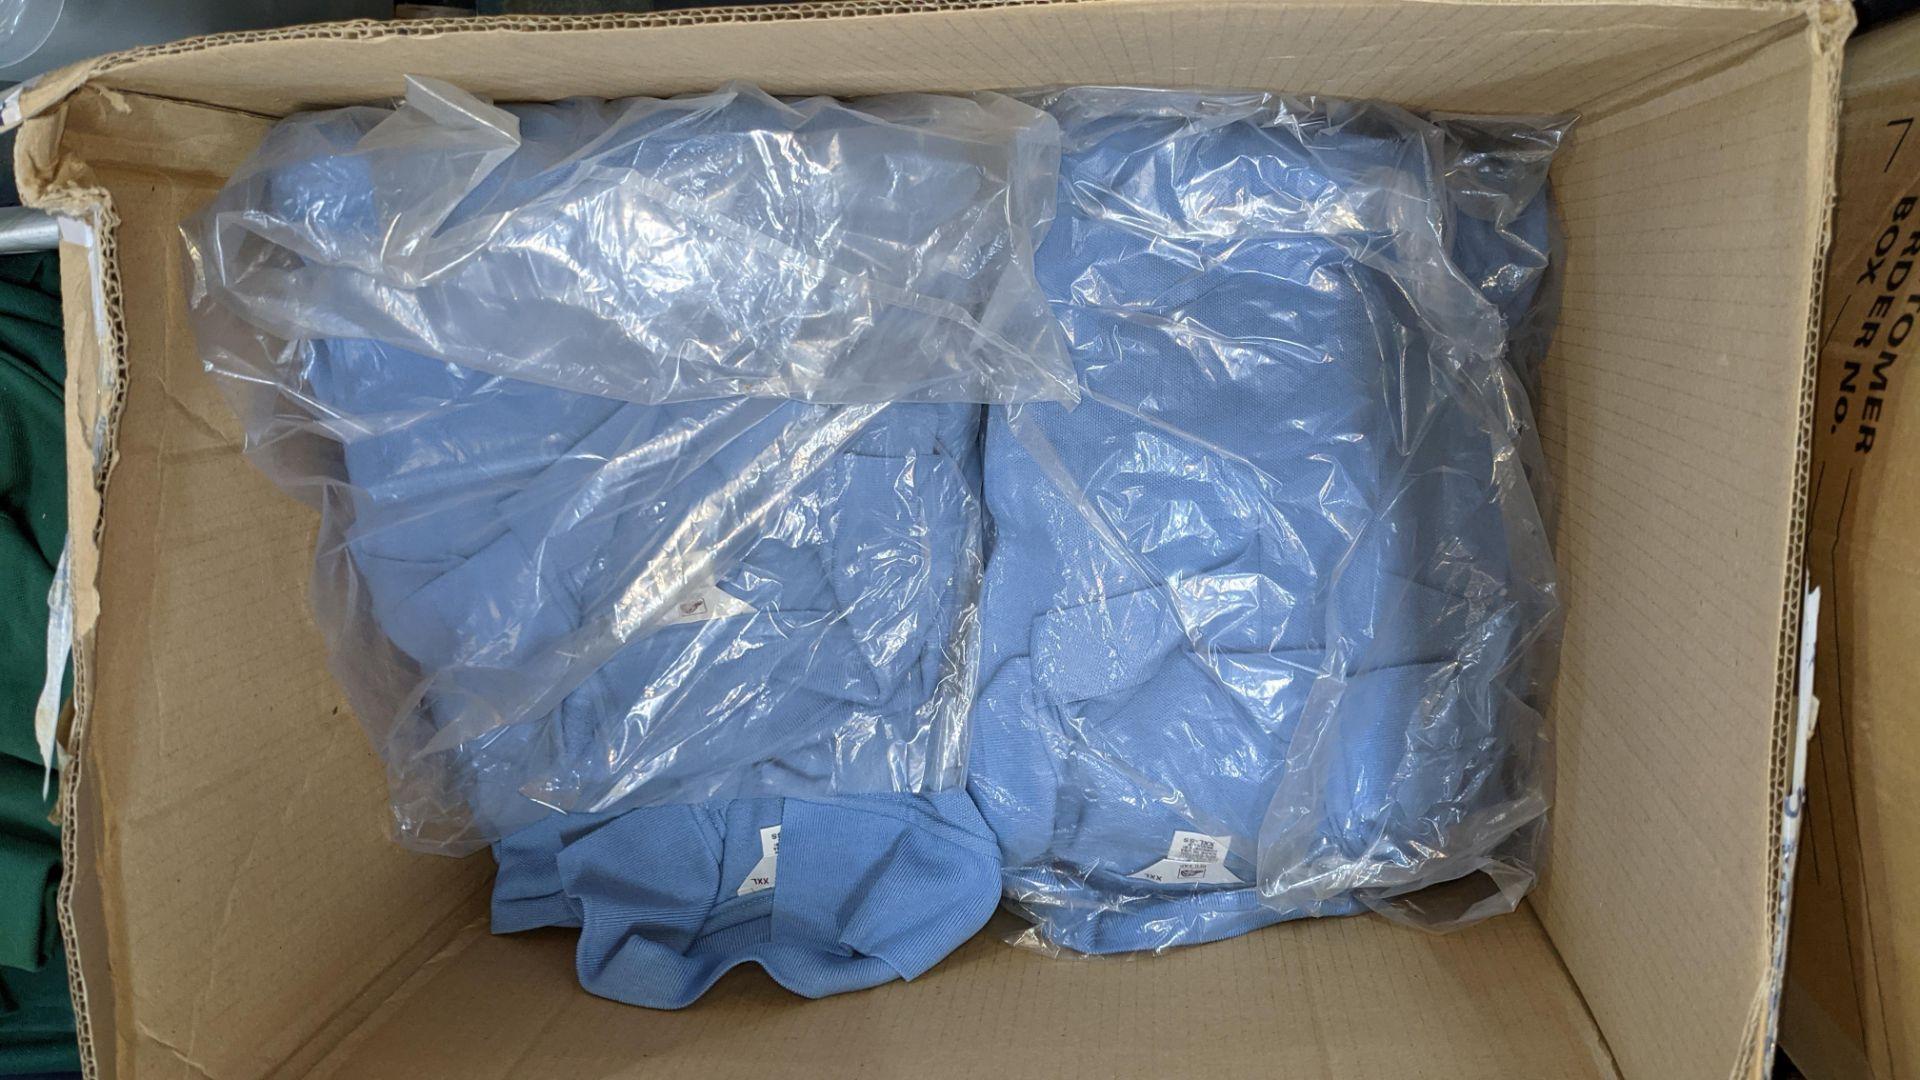 20 assorted polo shirts - 1 large box - Image 5 of 5